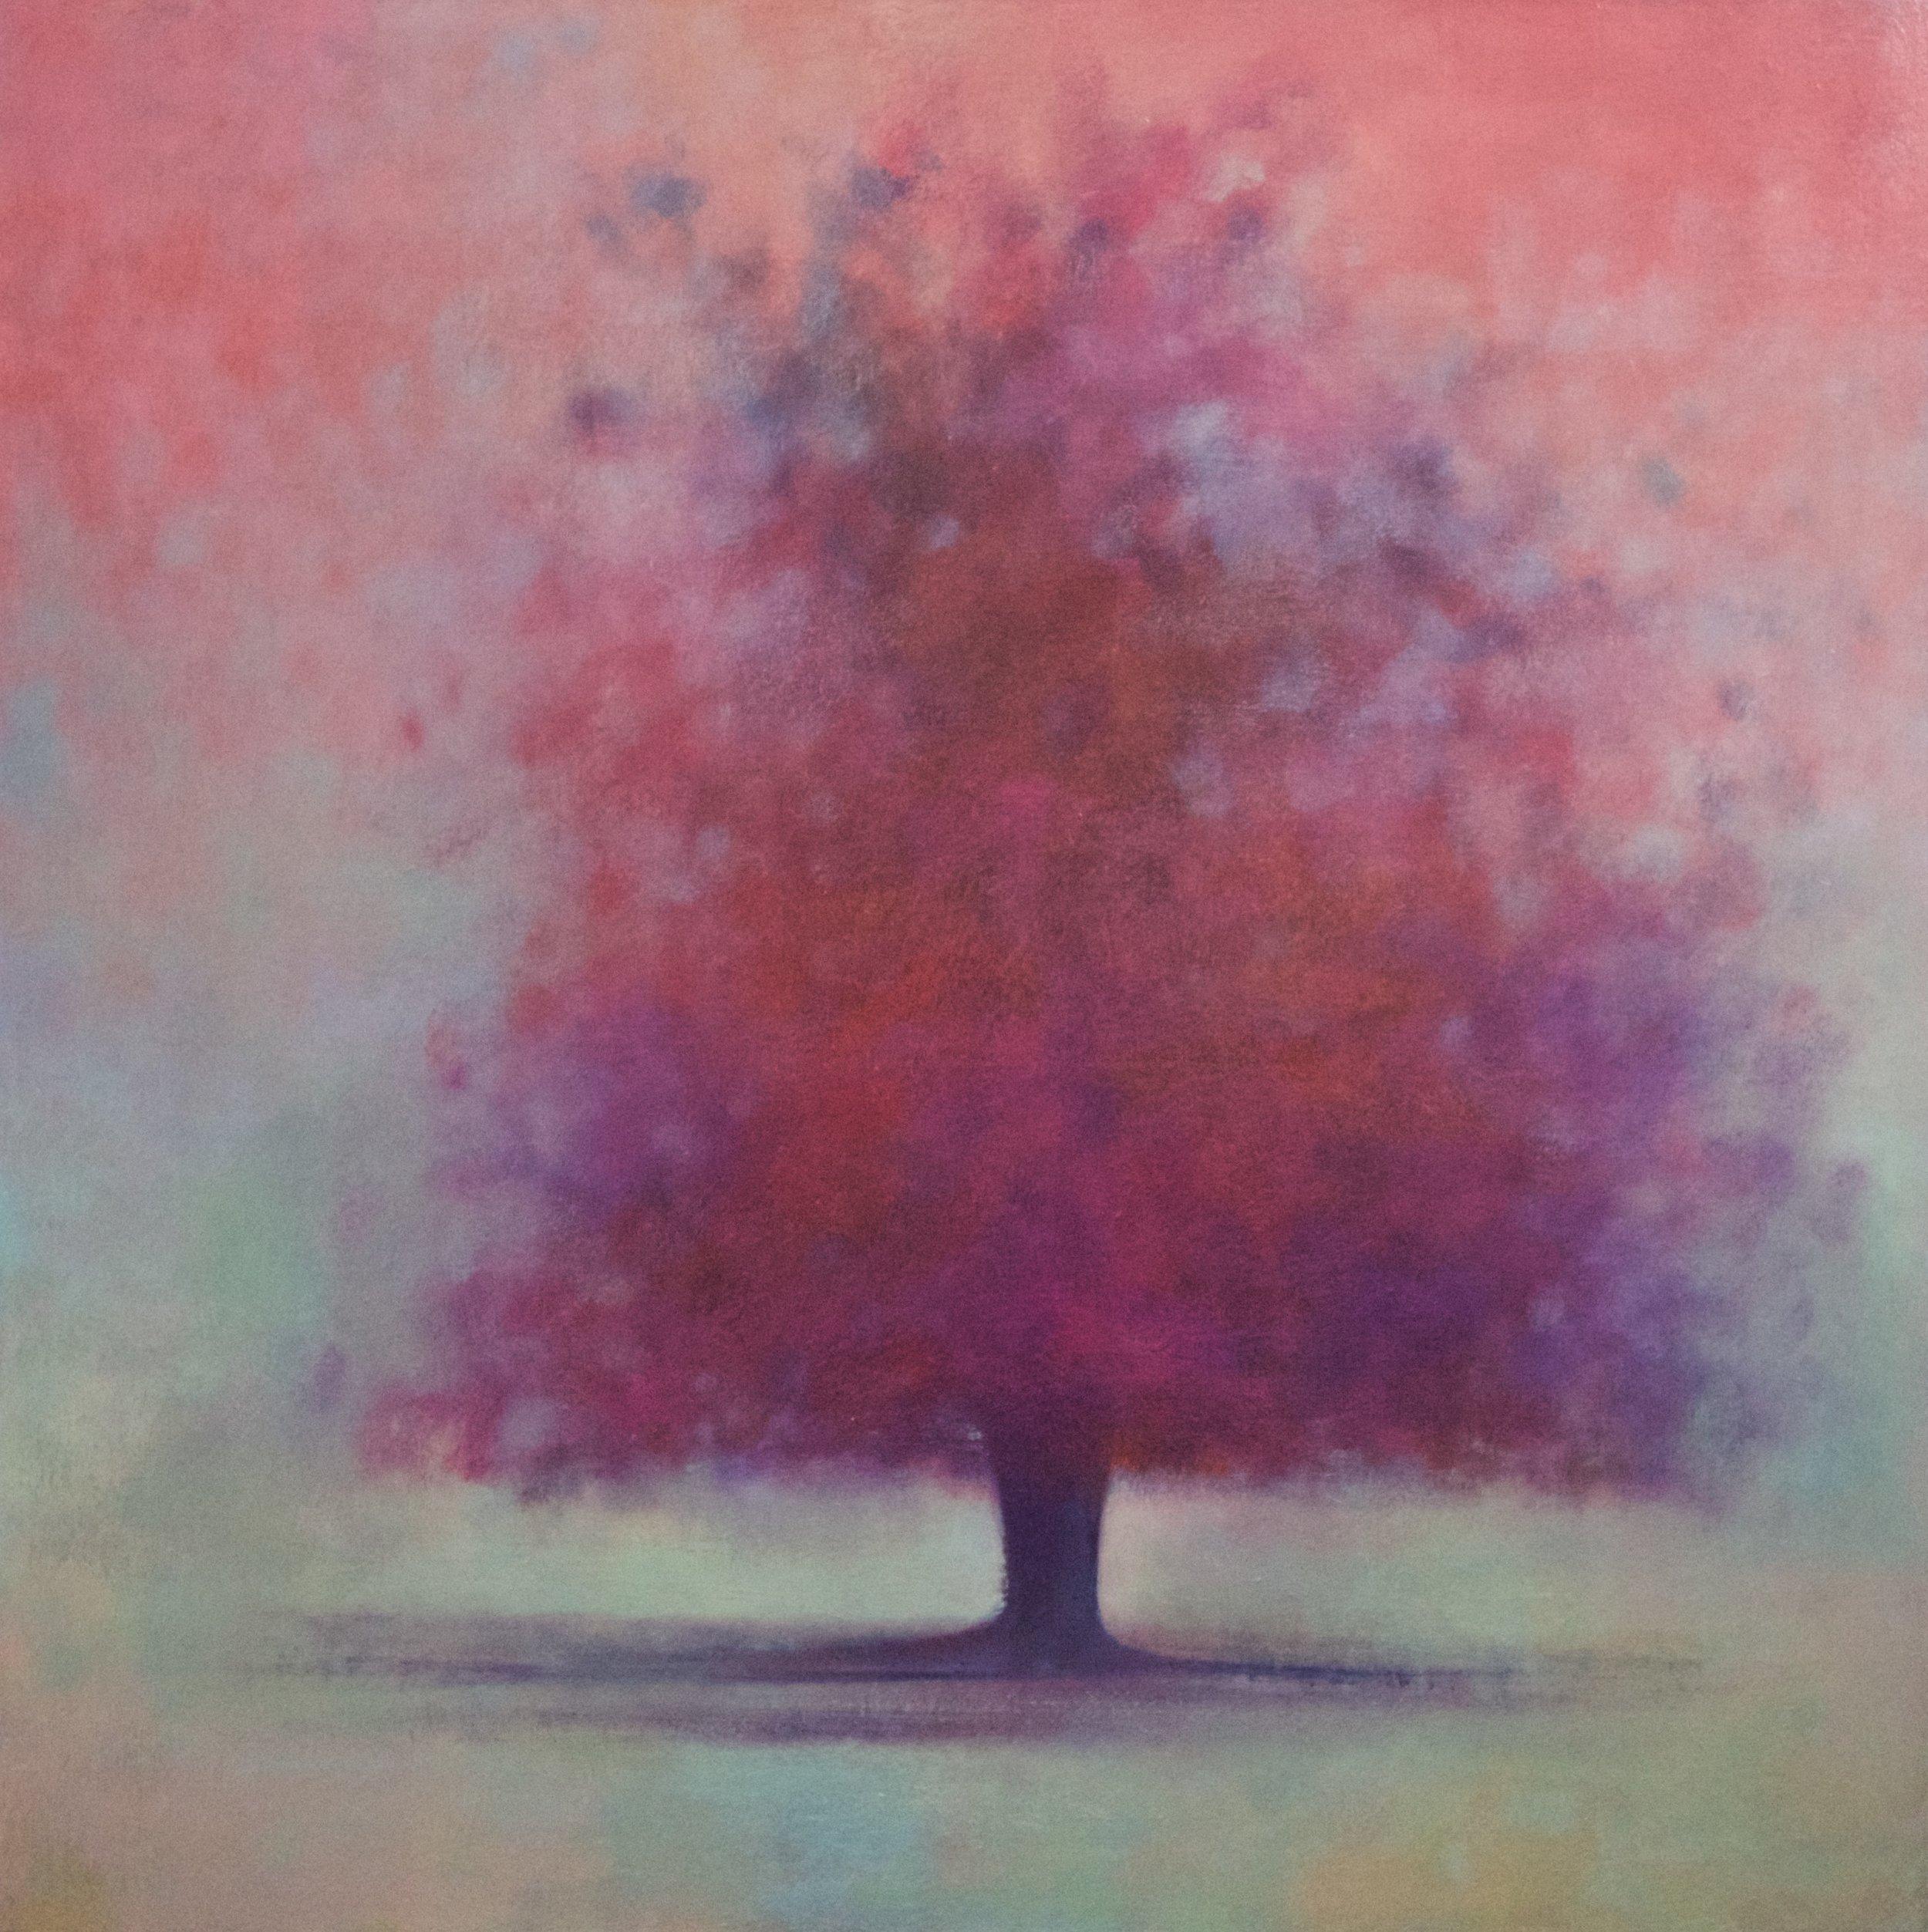 Title: Scarlett Flourish  Size: 92 x 92 cm  Medium: Oil on canvas  Price: £2350